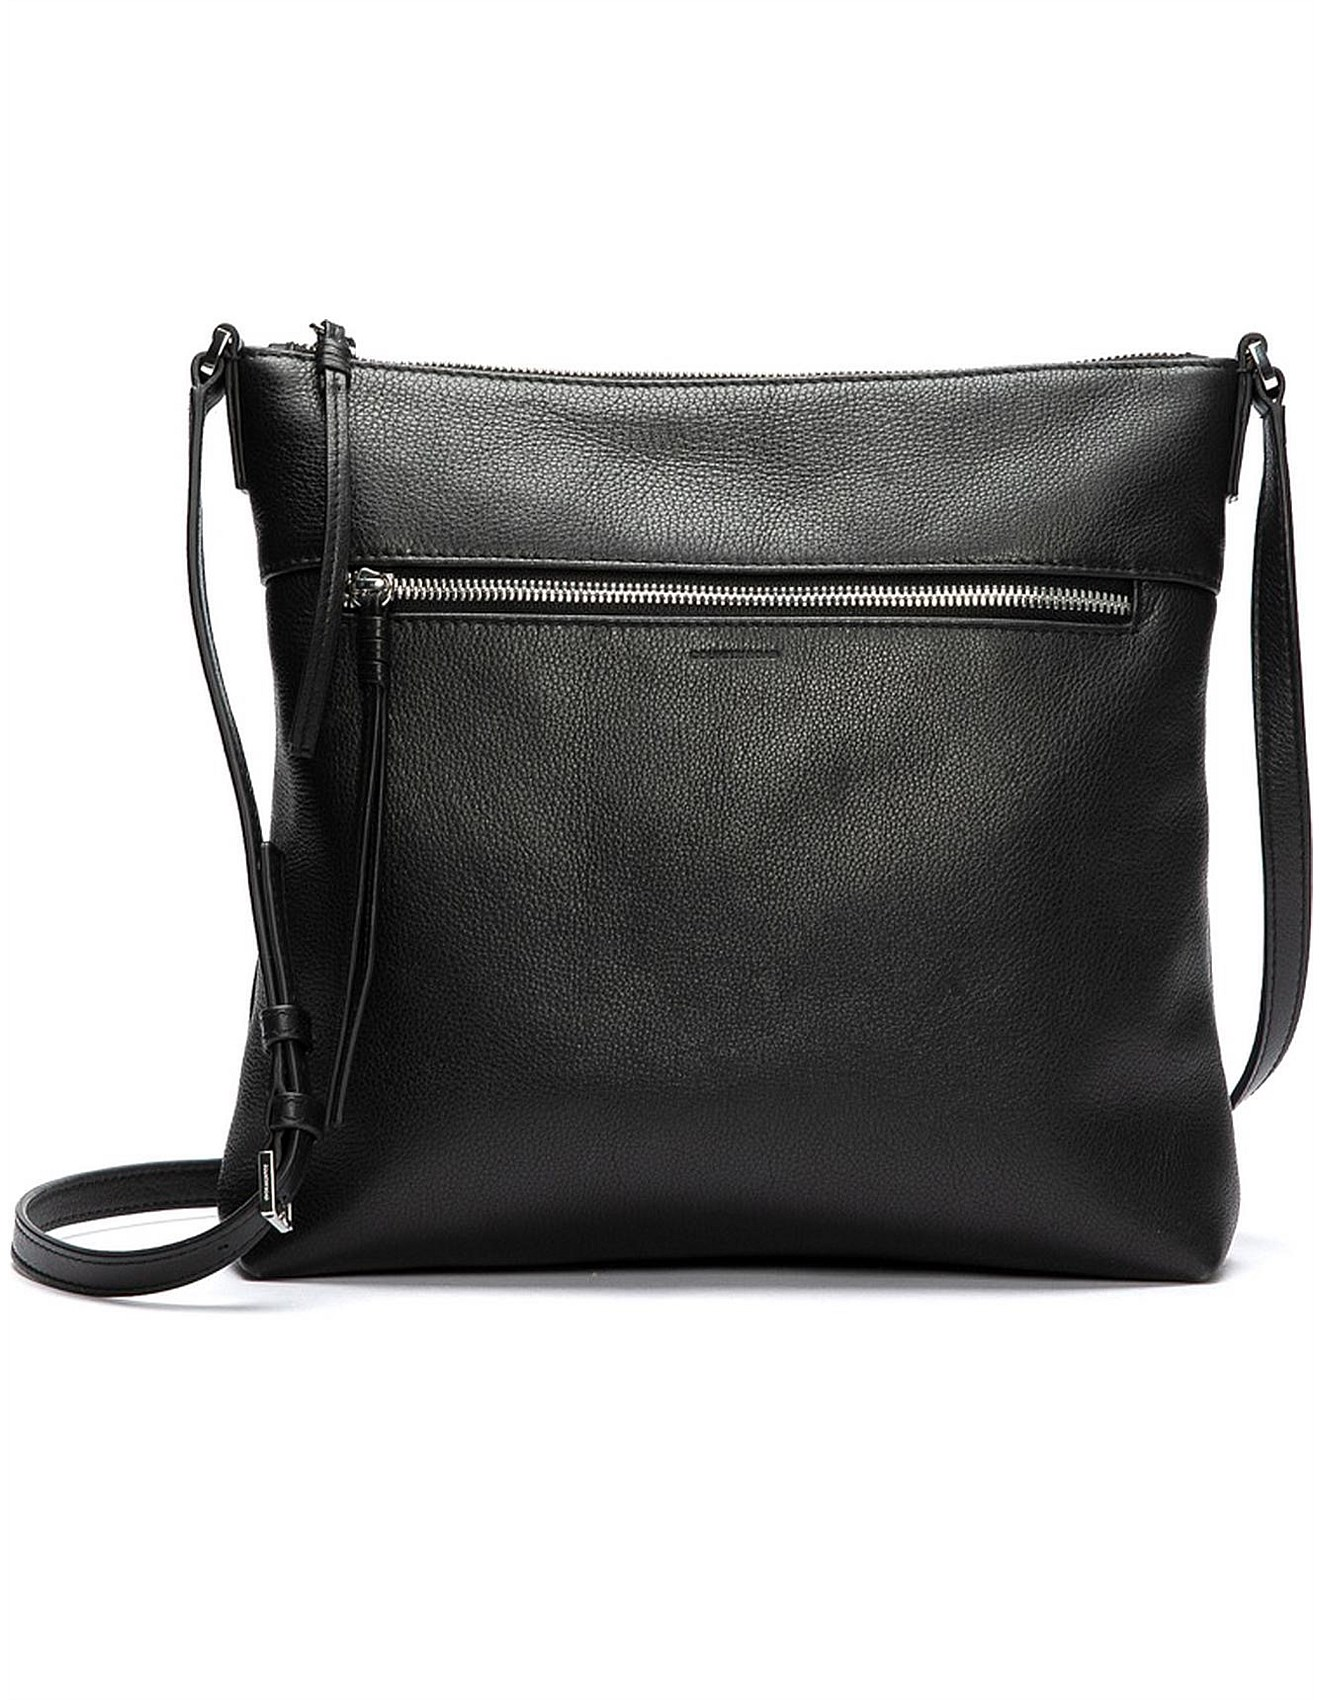 47b7ea61a8e Overnight   Travel Bags